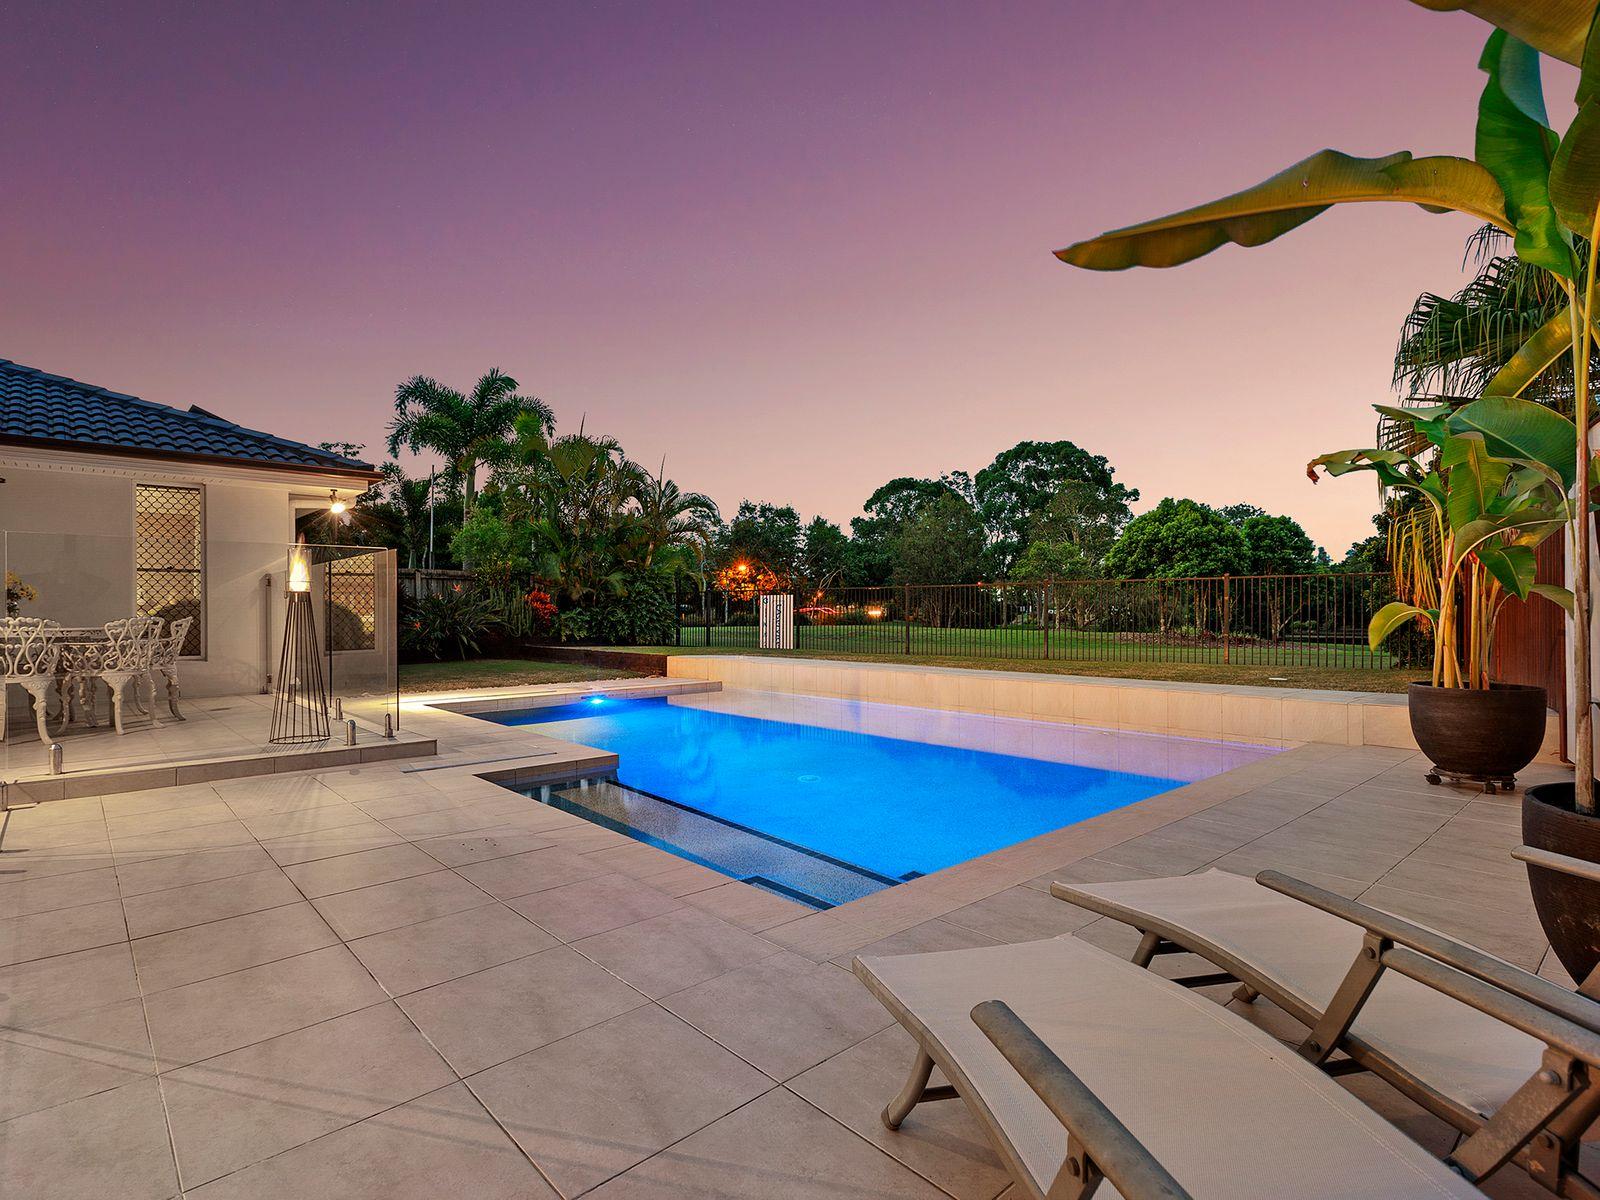 3 Oak Grove Way, Sippy Downs, QLD 4556